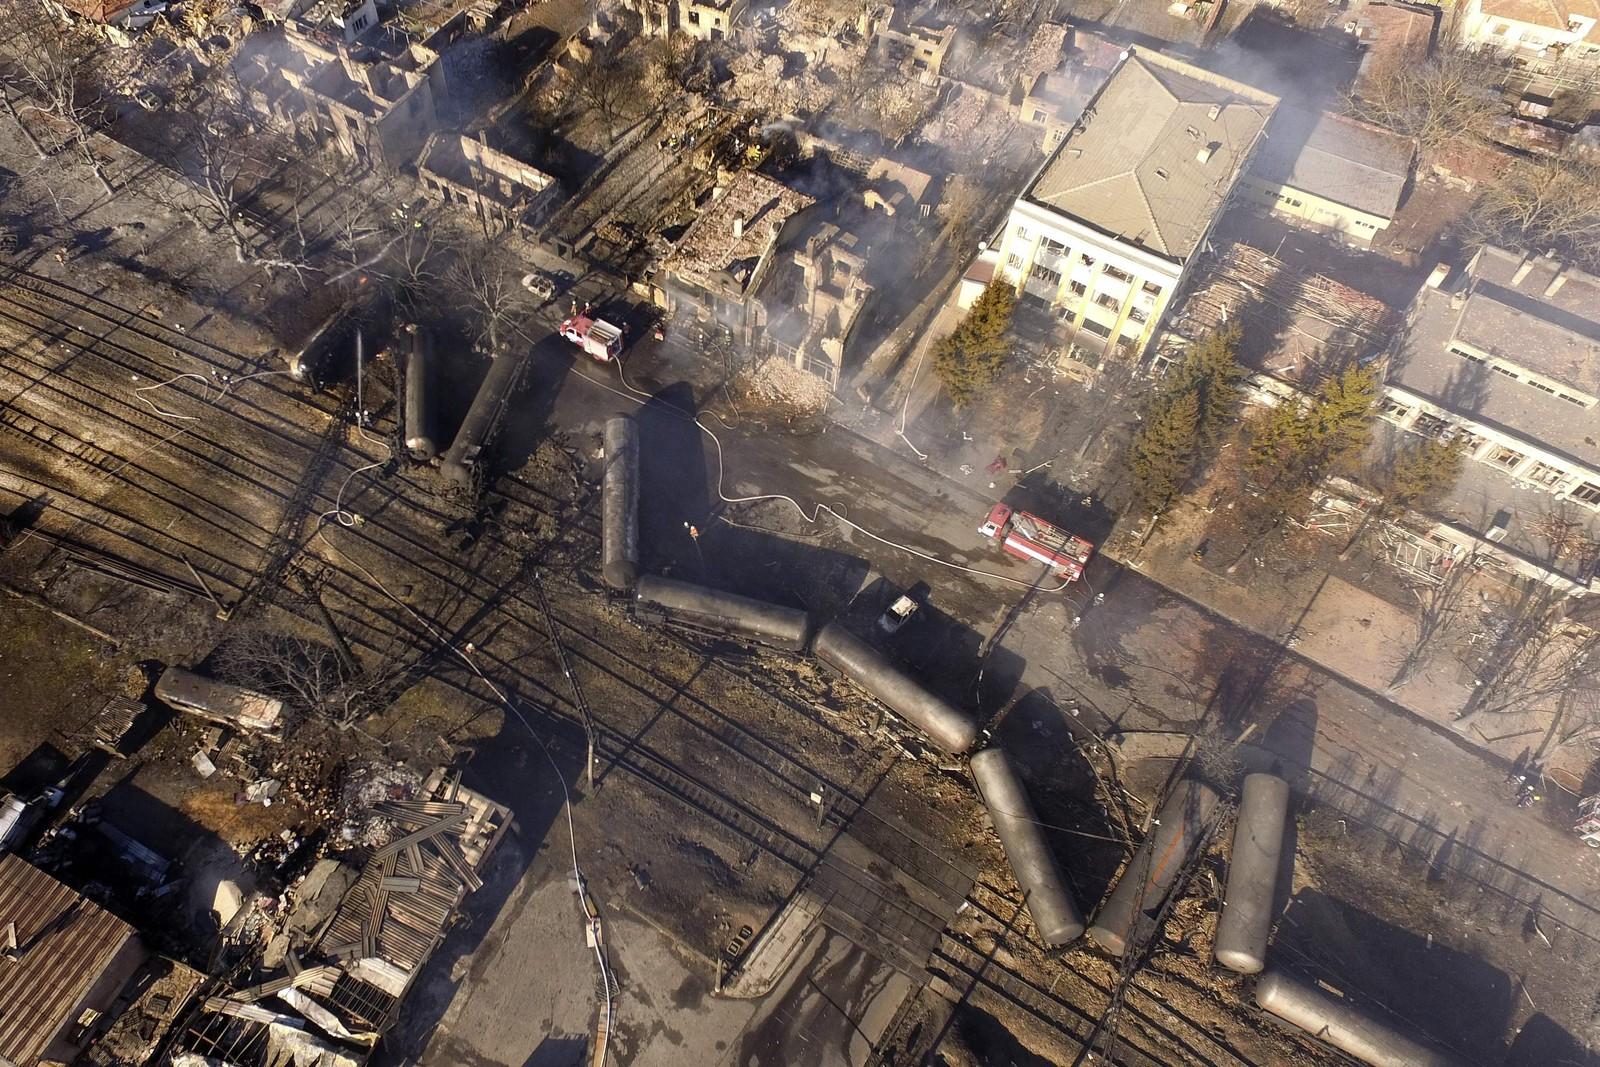 Luftfoto som viser ulykkesstoget.